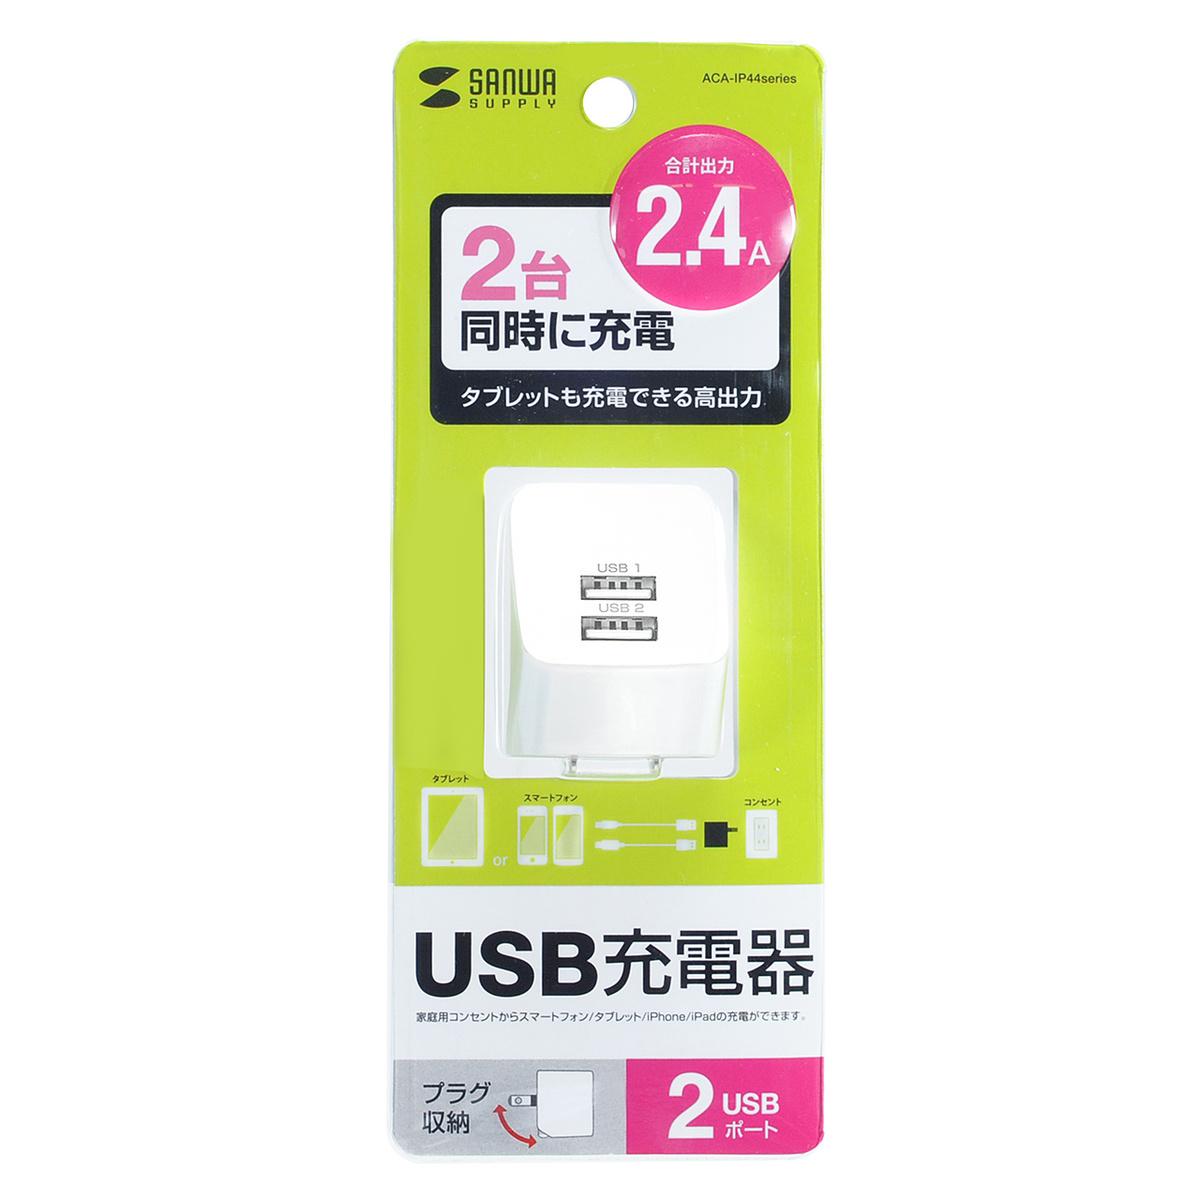 [ACA-IP44W] USB充電器(2ポート・合計2.4A・ホワイト)